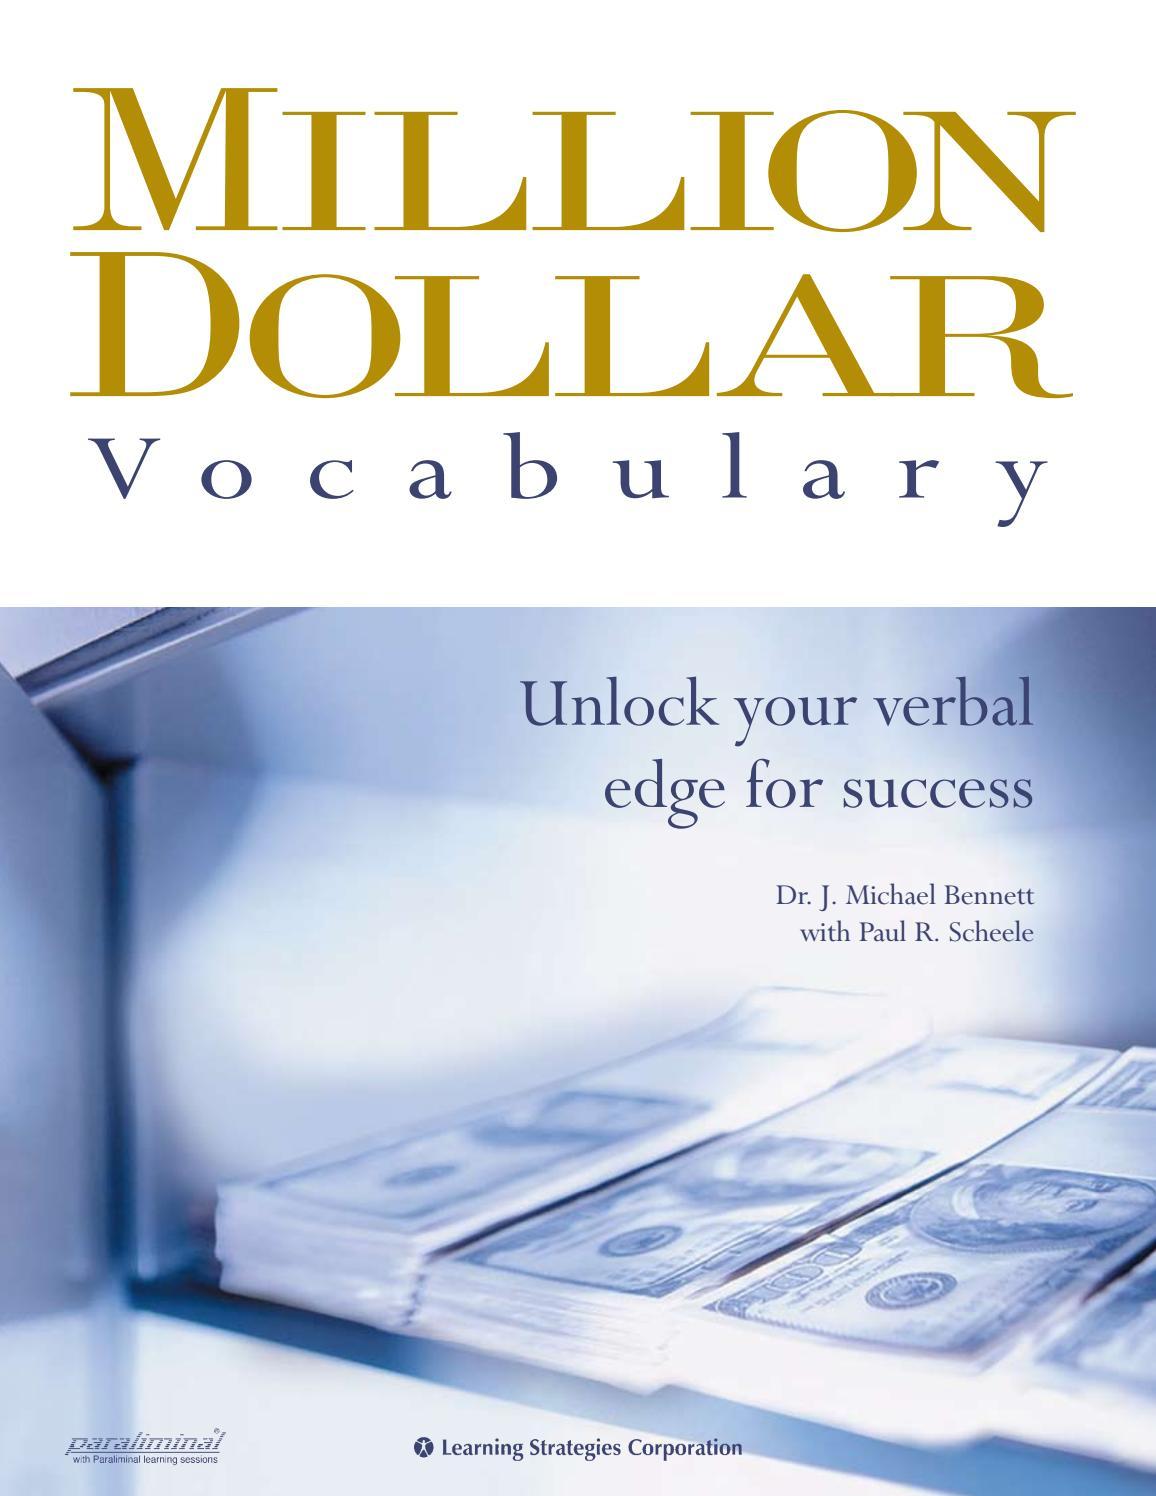 Million Dollar Vocabulary Manual by Serhat Çimen - issuu